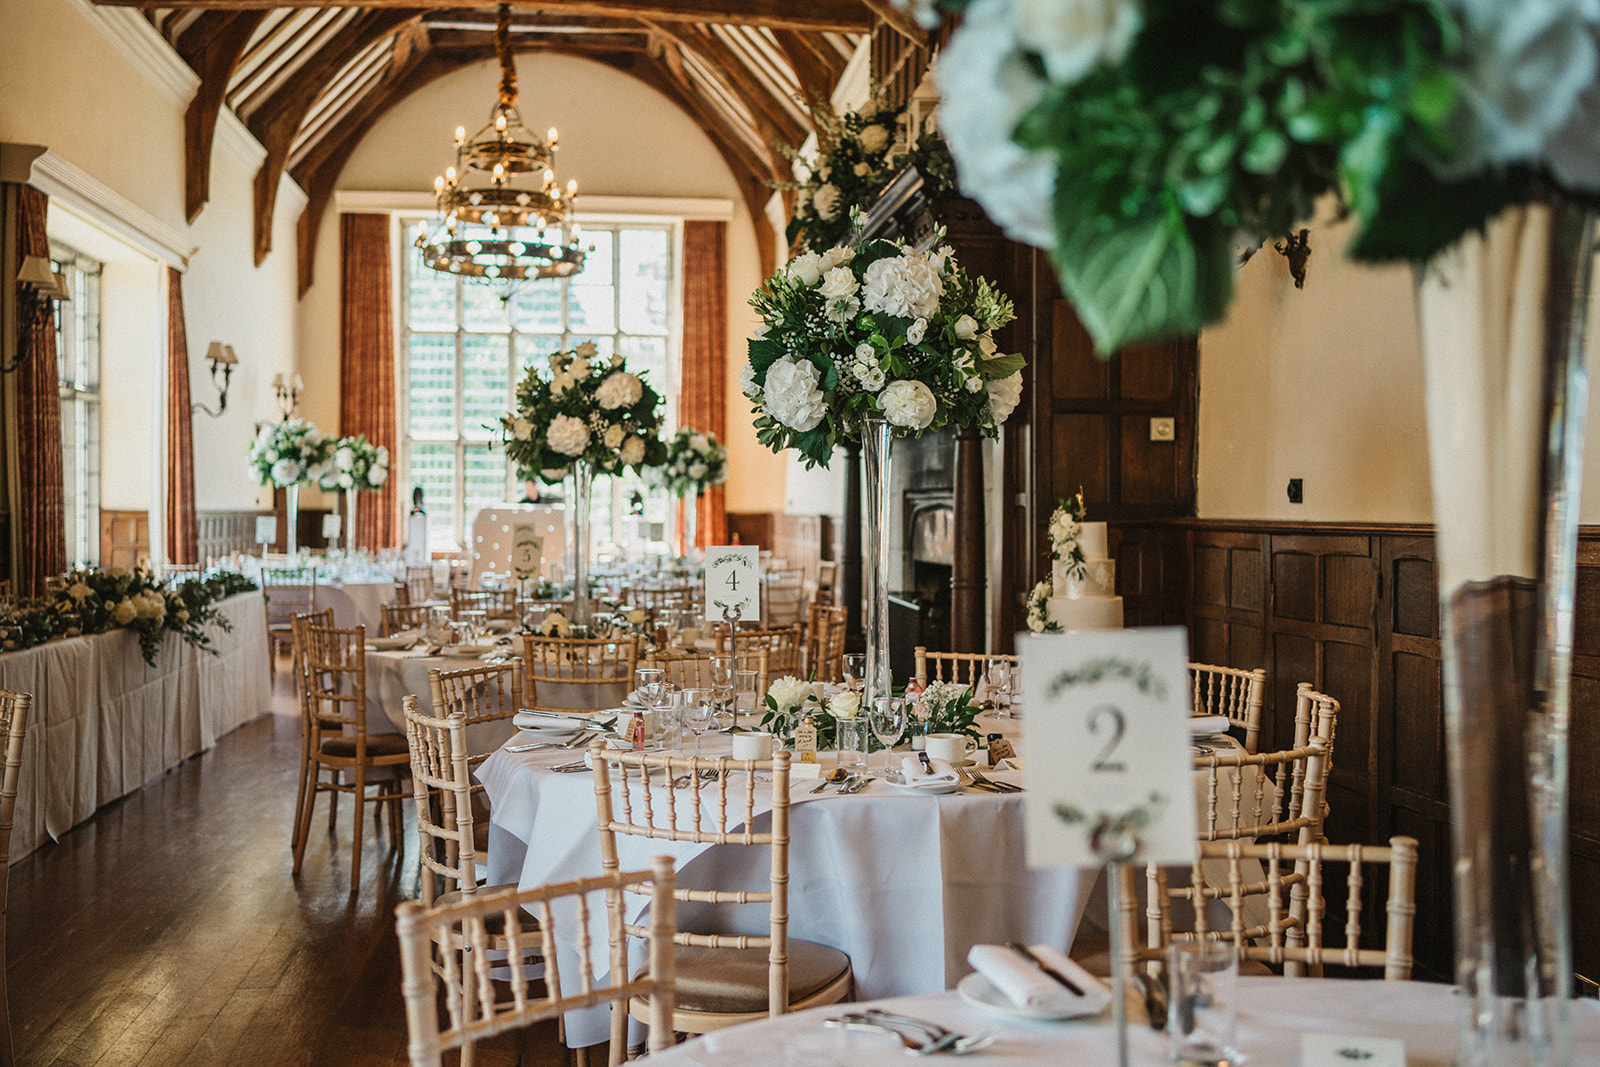 The wedding reception room